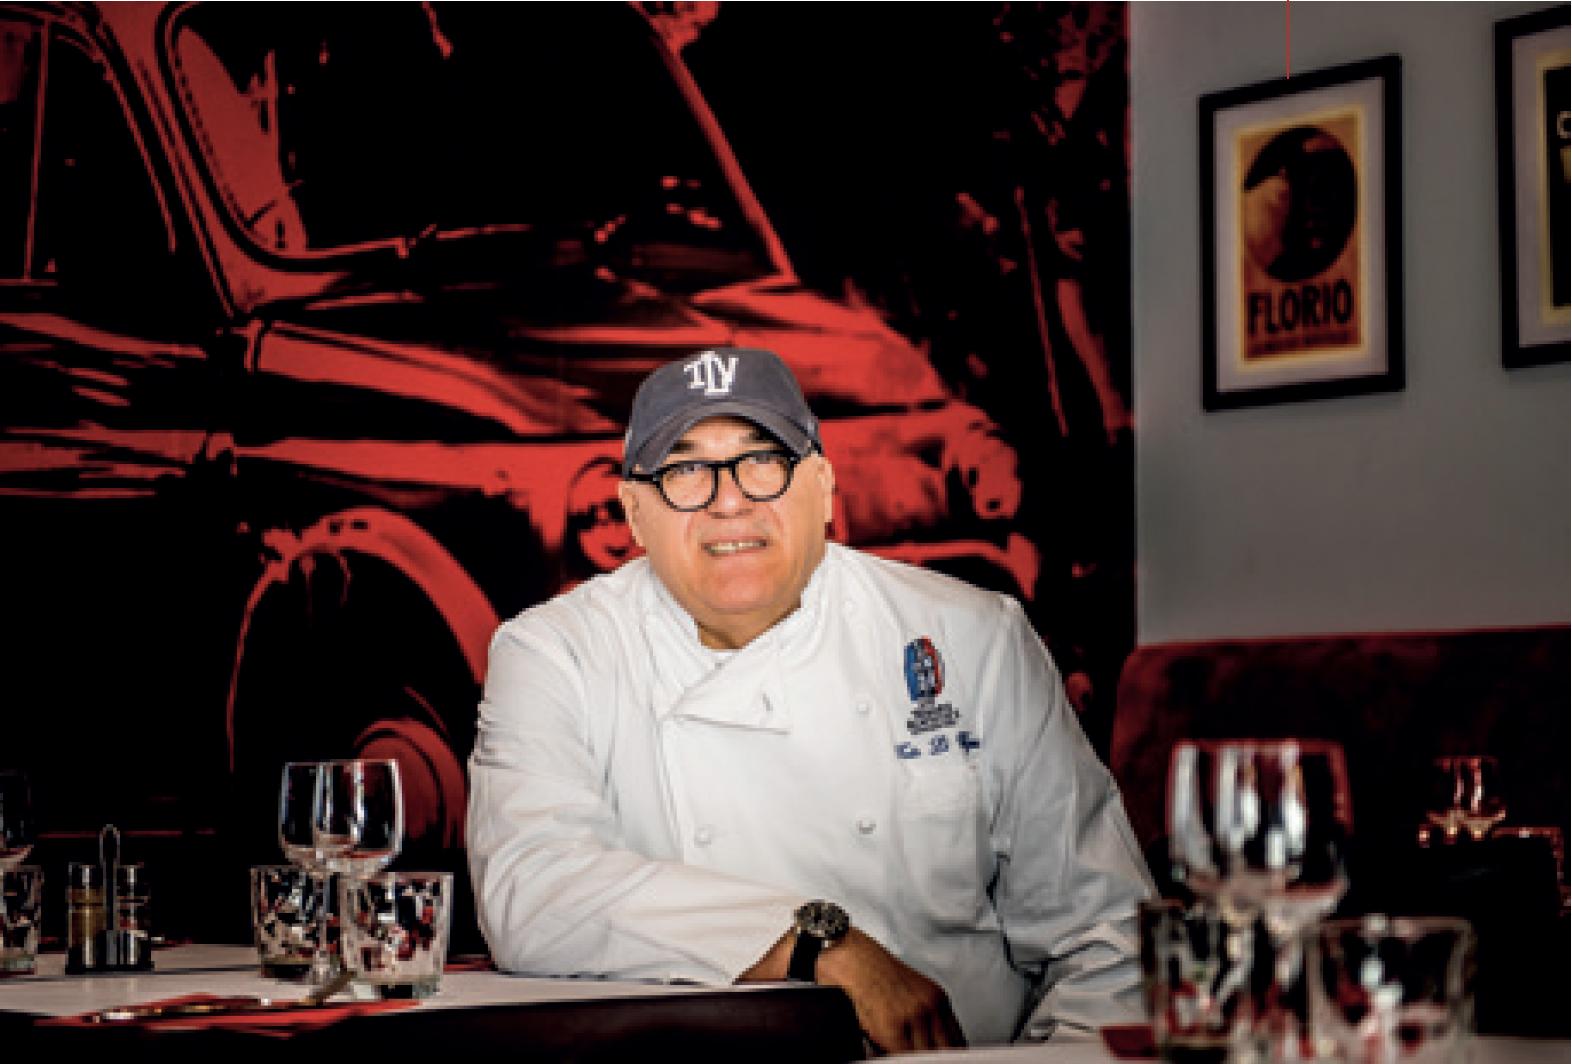 http://www.toques-blanches-lyonnaises.com/file/2020/01/toto-li-vigni-ristorante.png